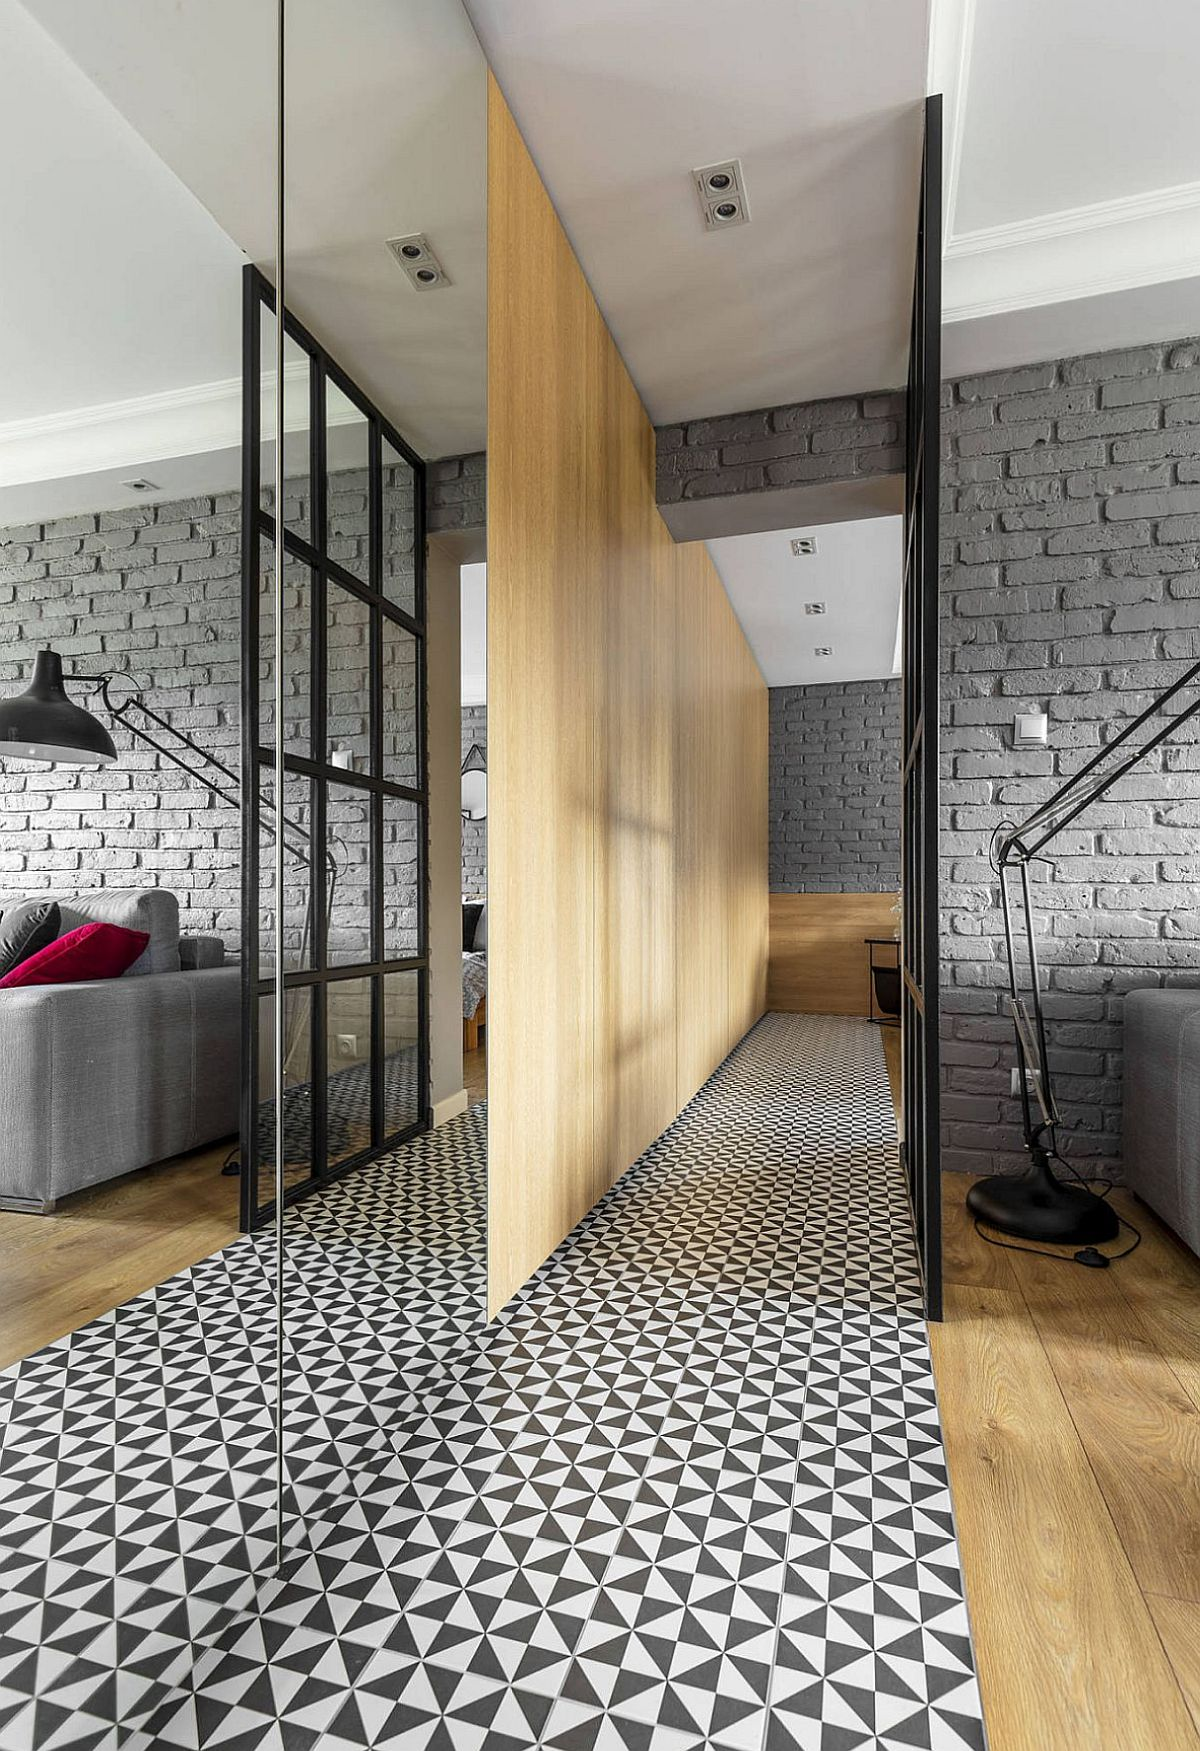 adelaparvu.com despre apartament 56 mp cu accente de rosu, design SAS Wnetrza i Kuchnie, Foto Strazynski Studio (12)